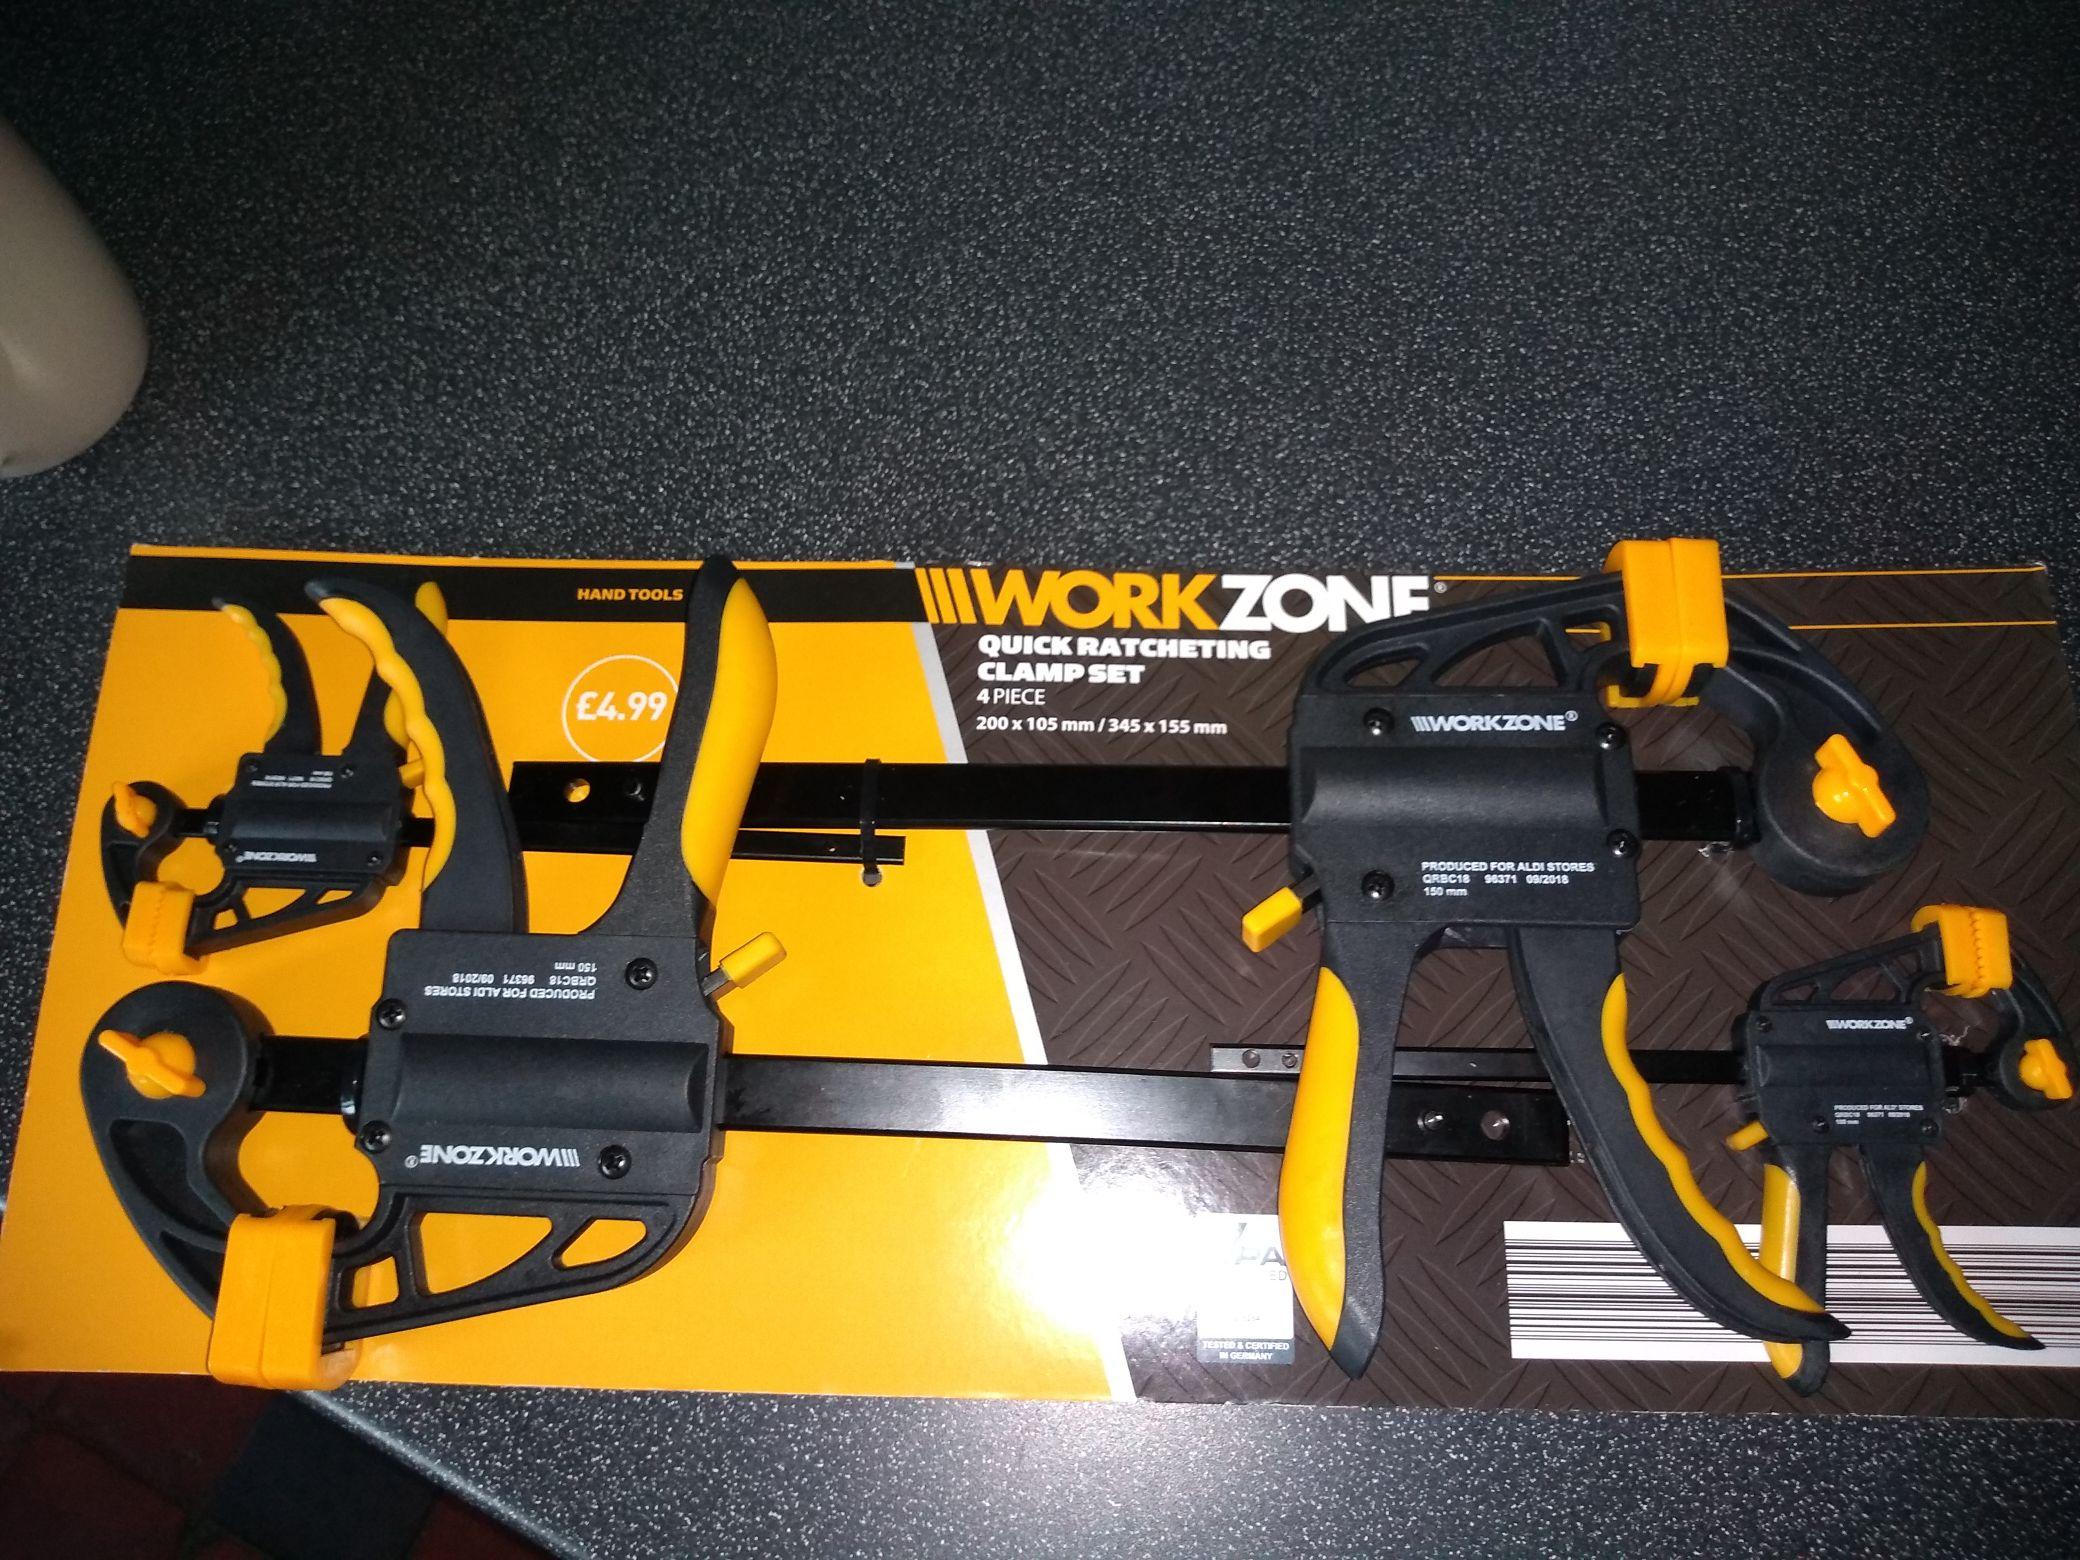 Workzone clamp set £4.99 instore @ Aldi York